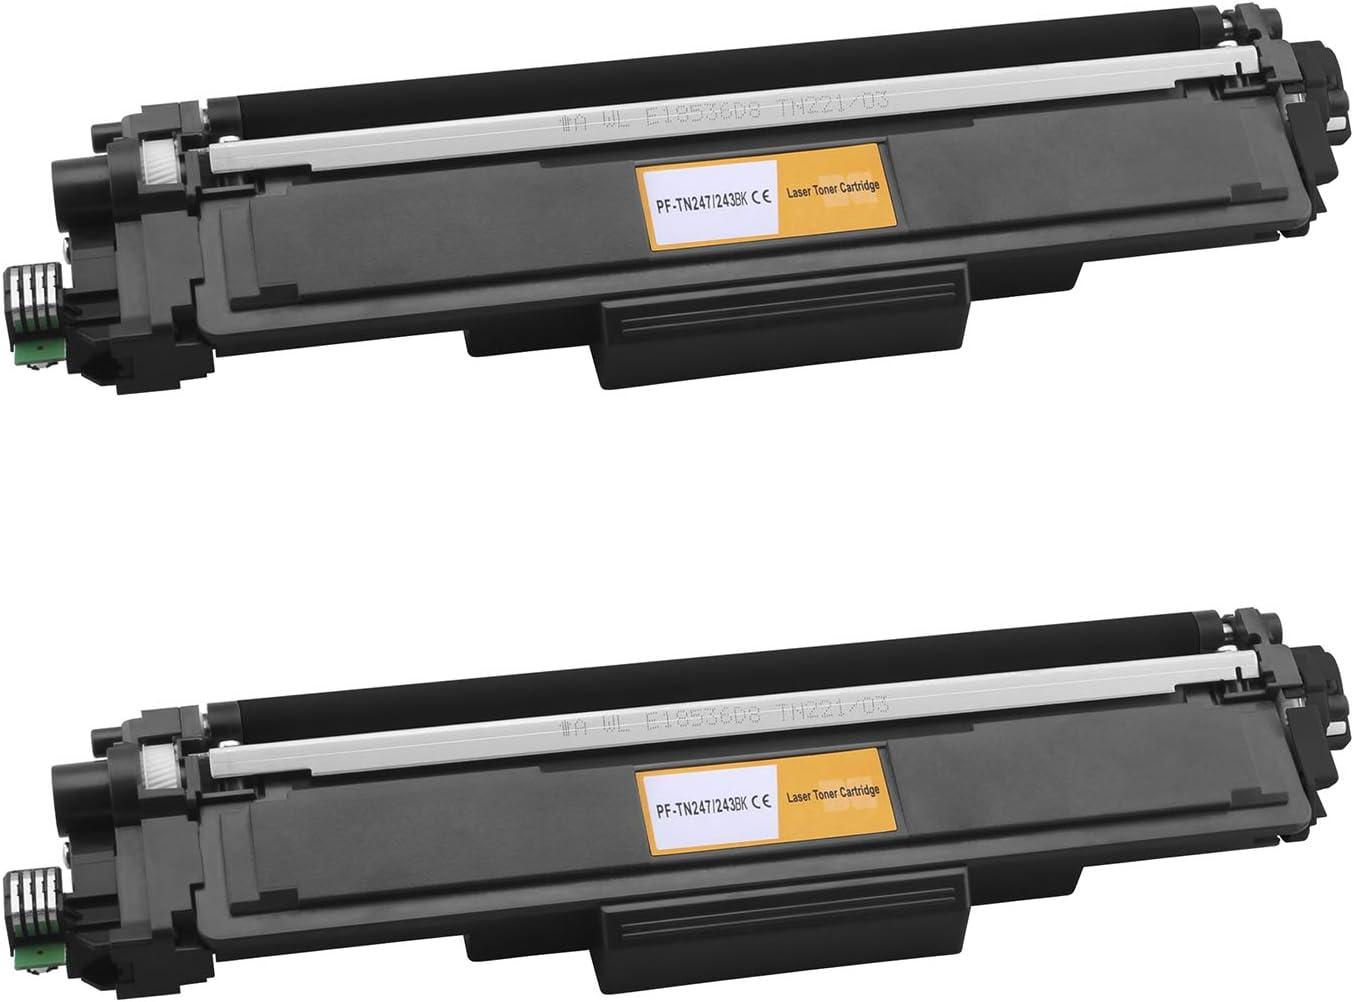 Gorilla Ink 5x Toner Cartridge Xxl With Chip For Brother Tn 243 Tn 247 Dcp L3510cdw L3550cdw Hl L3210cw L3230cdw L3270cdw Mfc L3710cw L3730cdn L3750cdw L3770cdw Black 3000 Pages Each Bürobedarf Schreibwaren